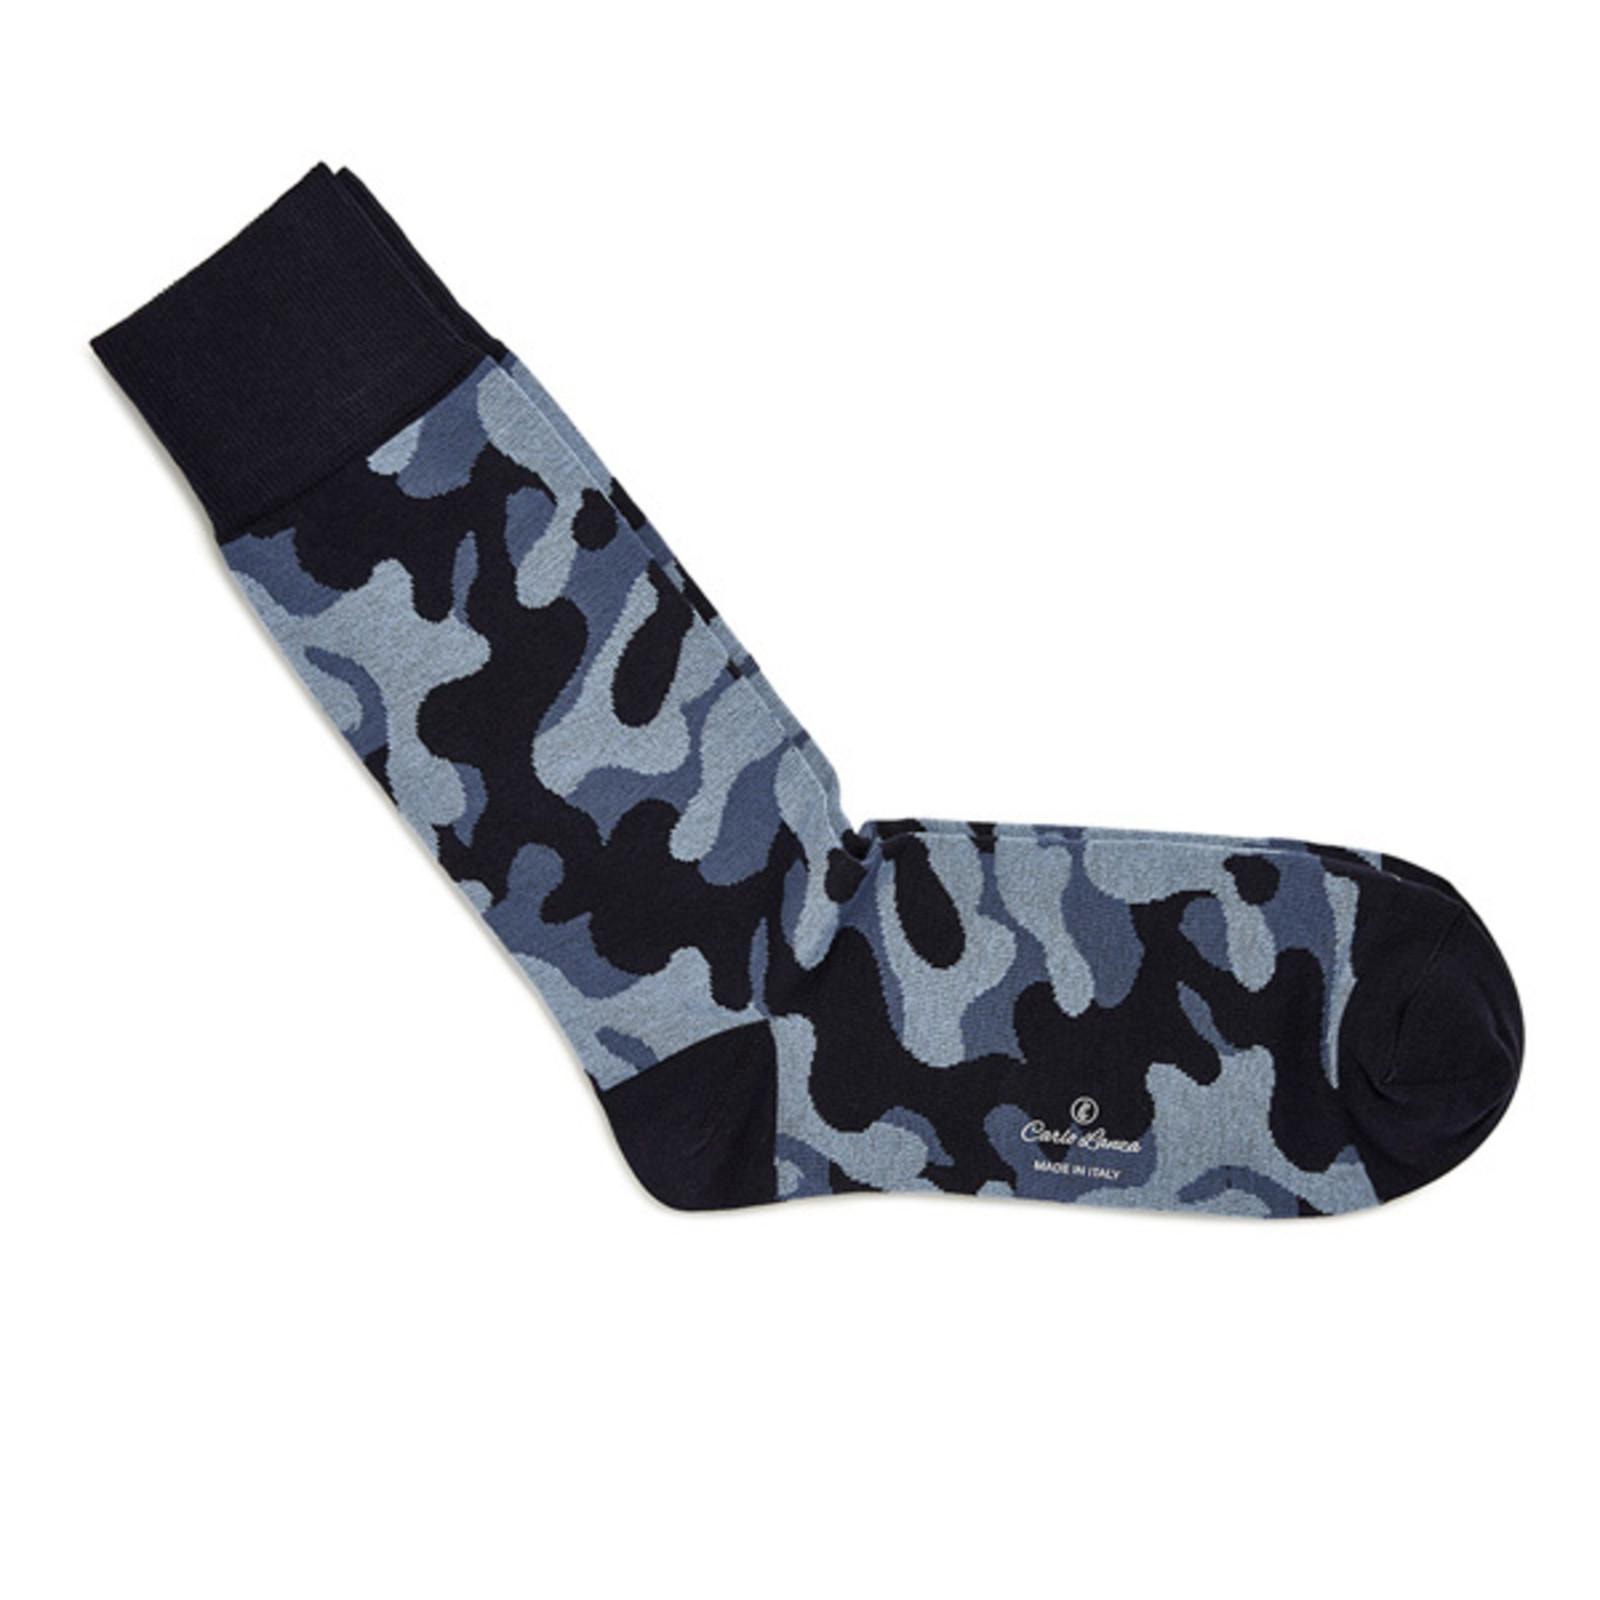 Carlo Lanza Camouflage katoenen sokken blauw   Carlo Lanza